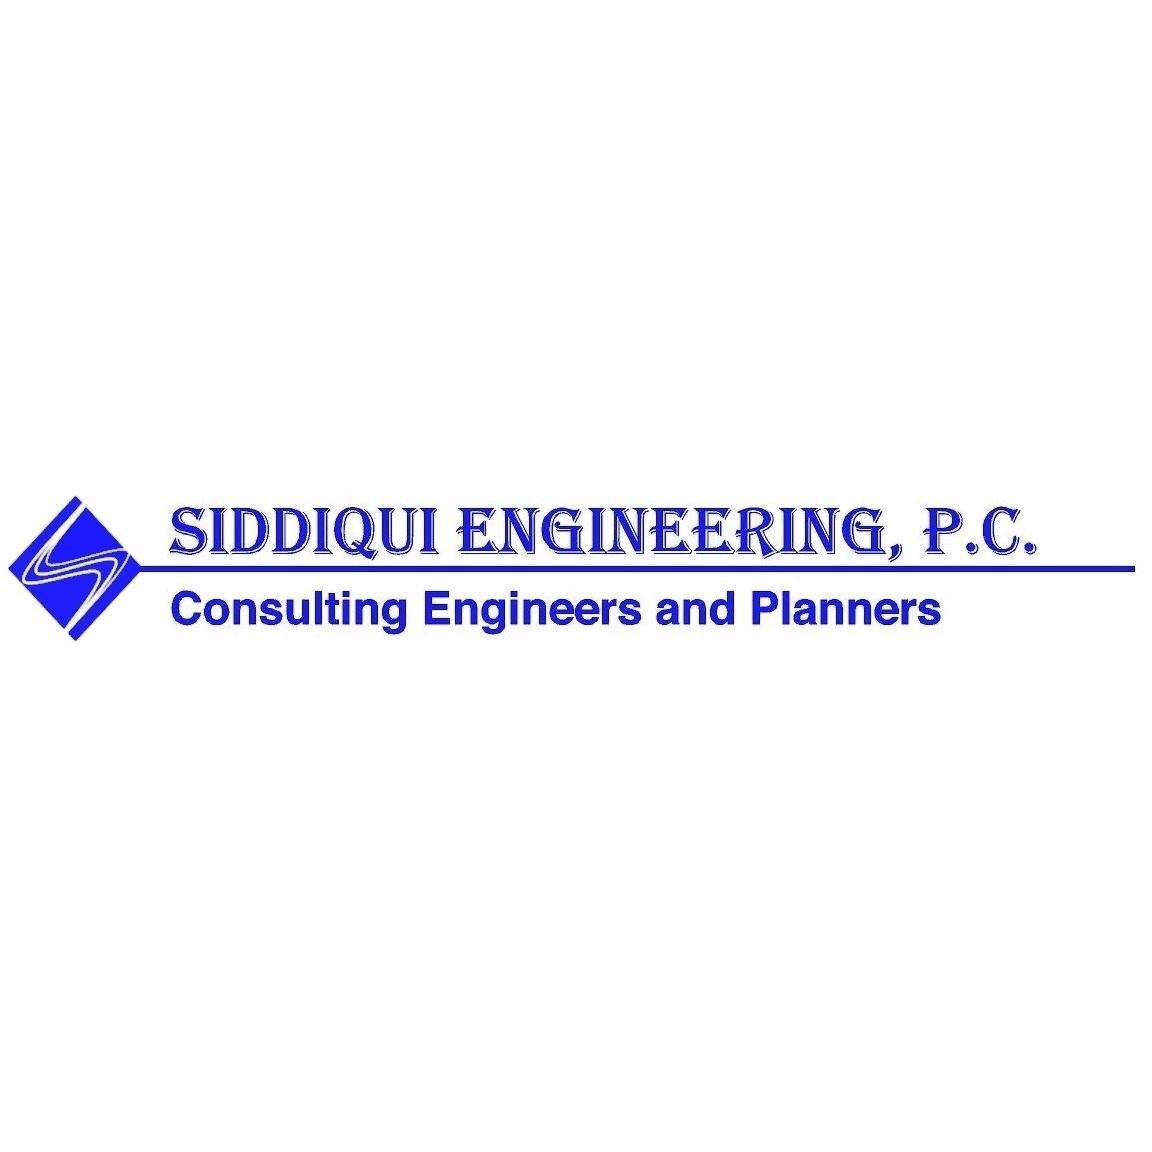 Siddiqui Engineering, PC image 6